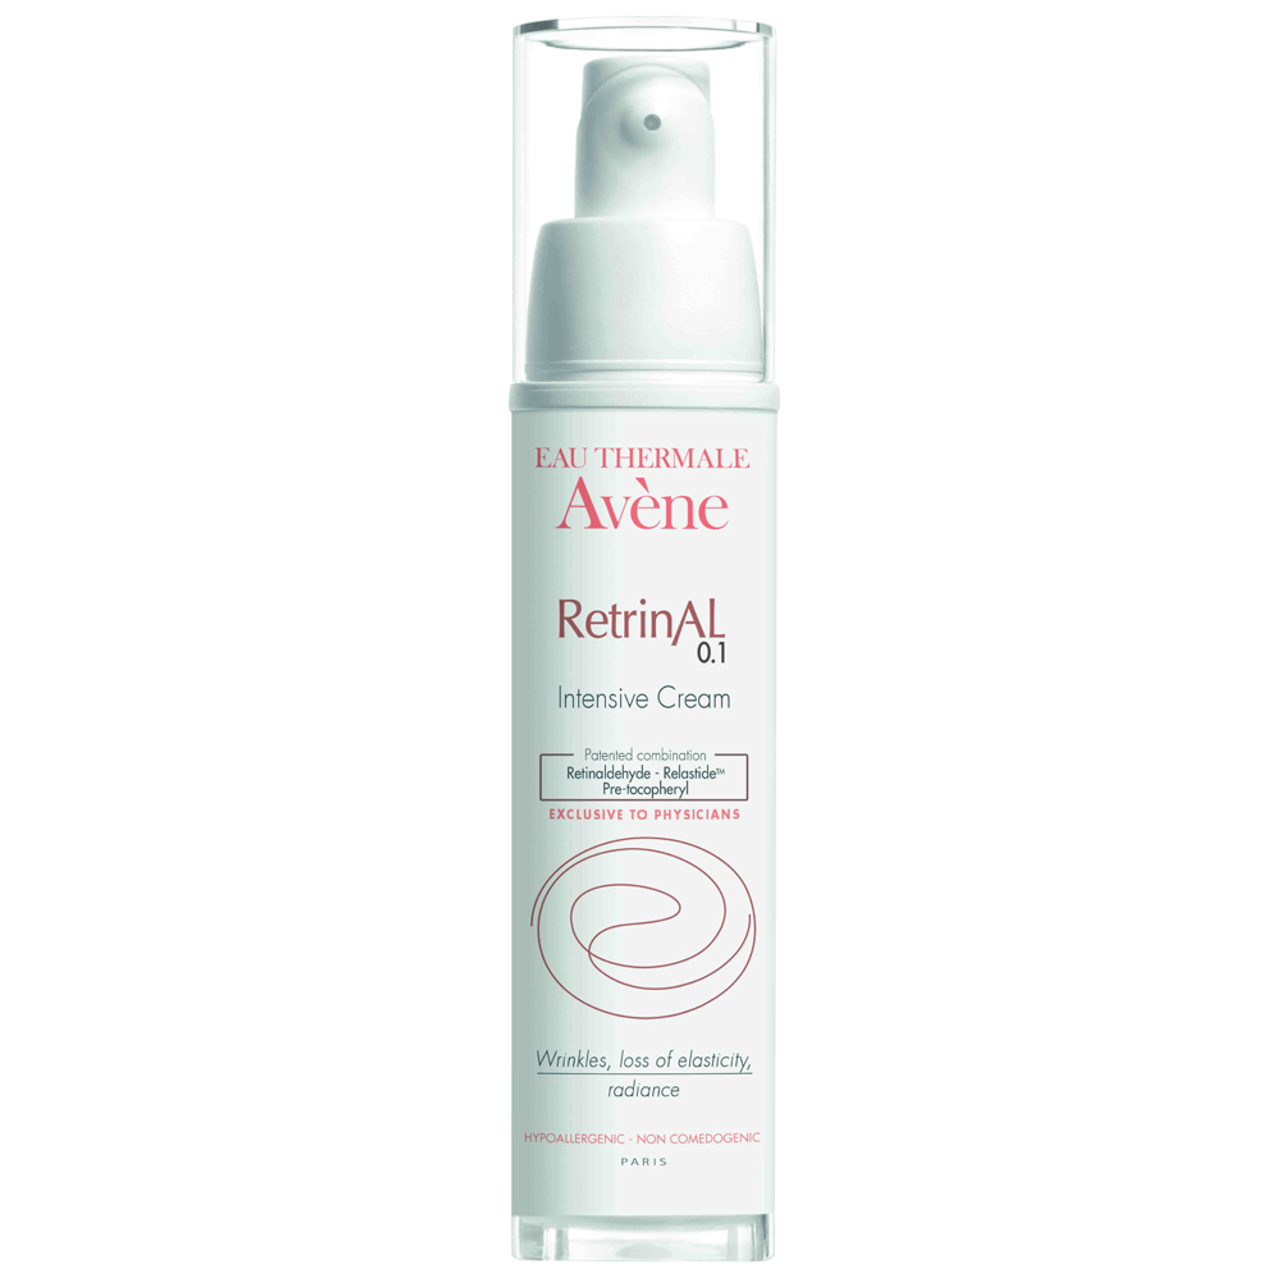 Avene Retrinal 0.1% Intensive Cream